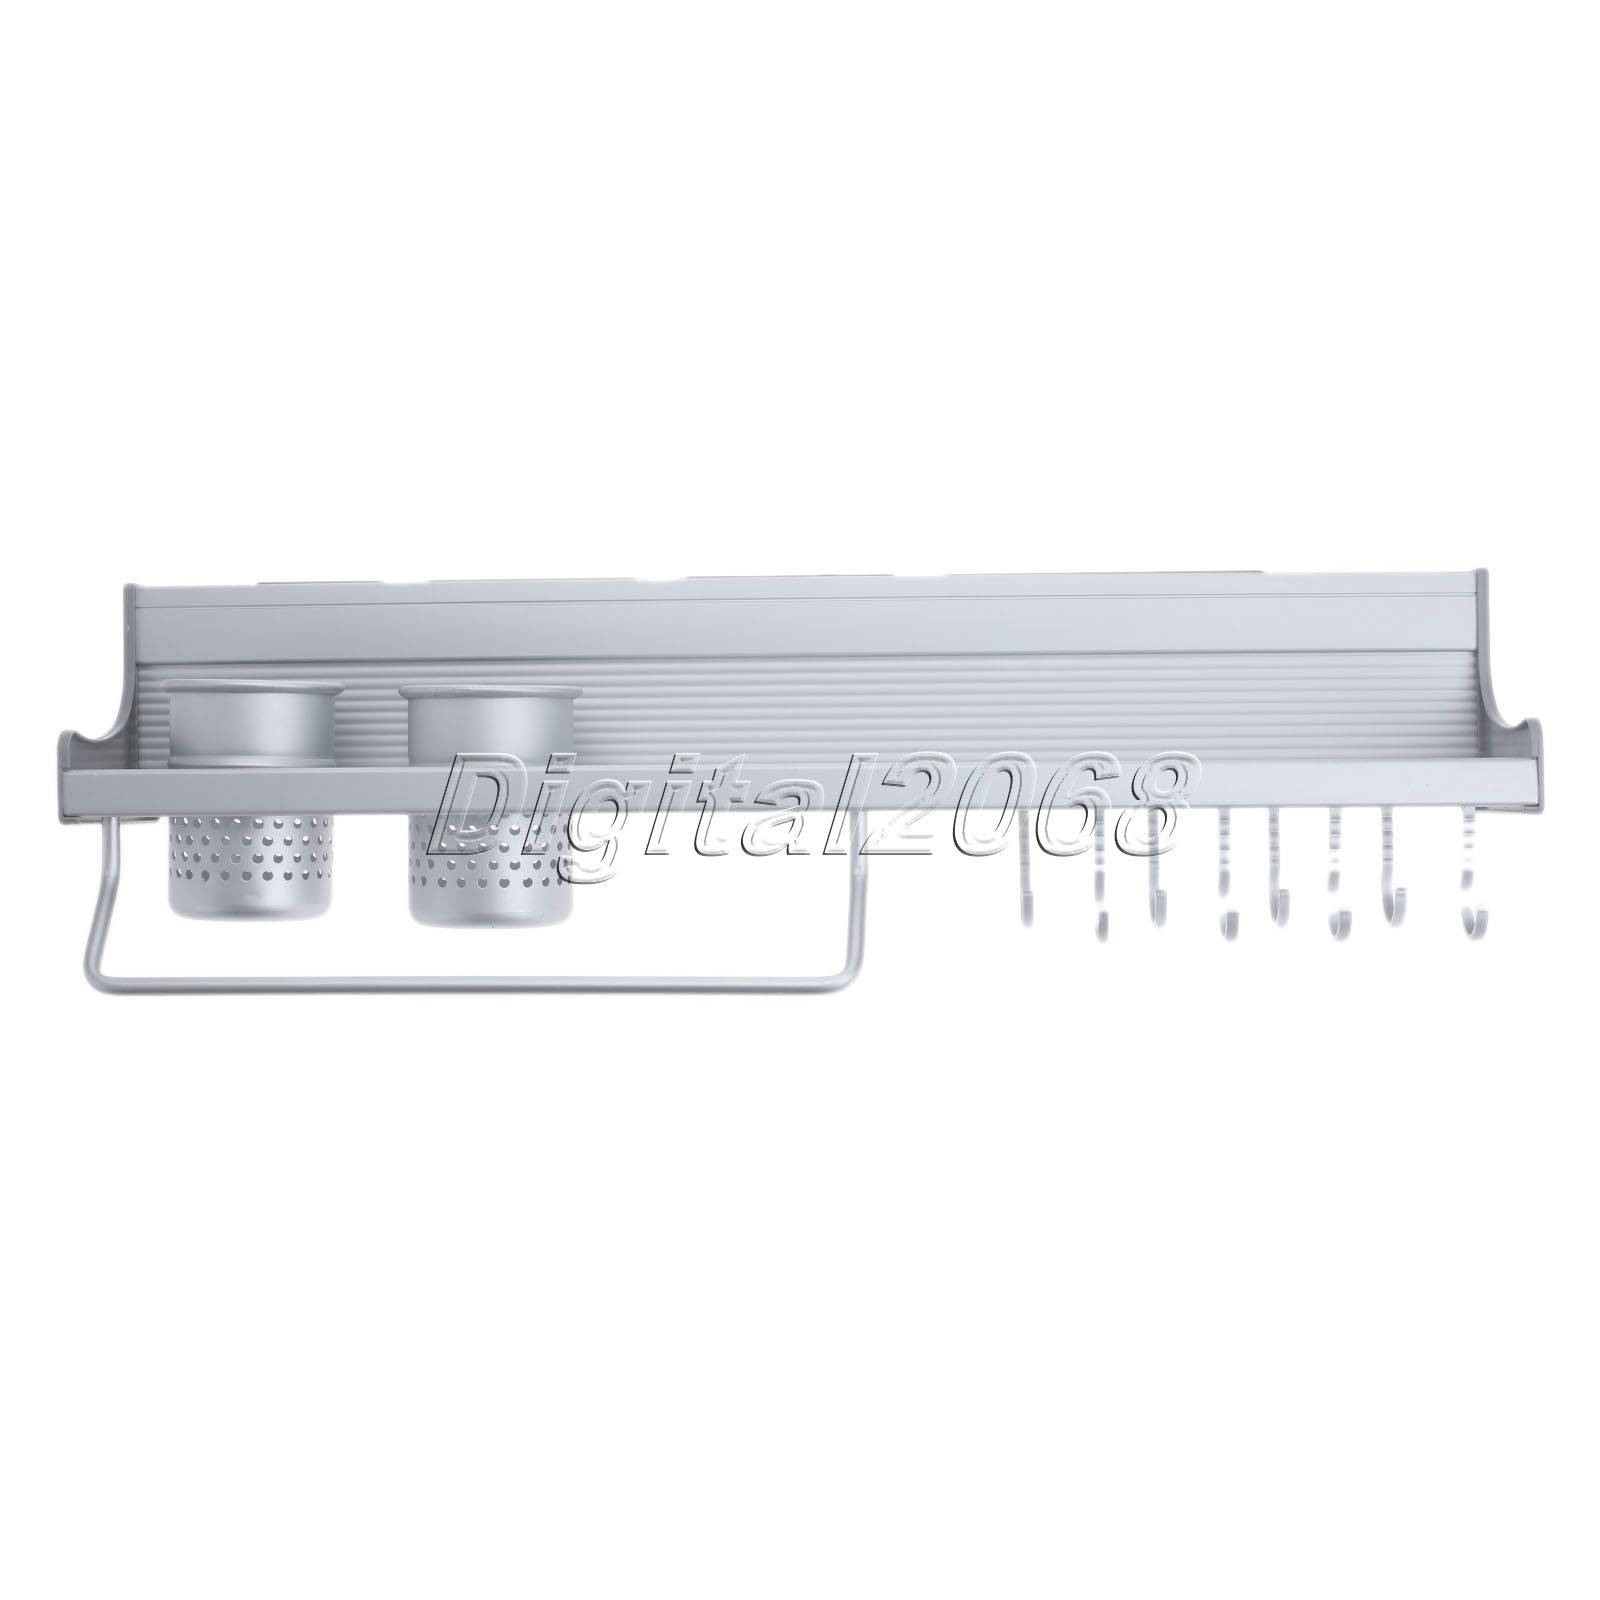 Space Aluminium Kitchen Storage Shelf Kitchen Rack Spice Tool Holder Wall Mount Dinnerware Wall Shelves Utensils Organizer 60cm